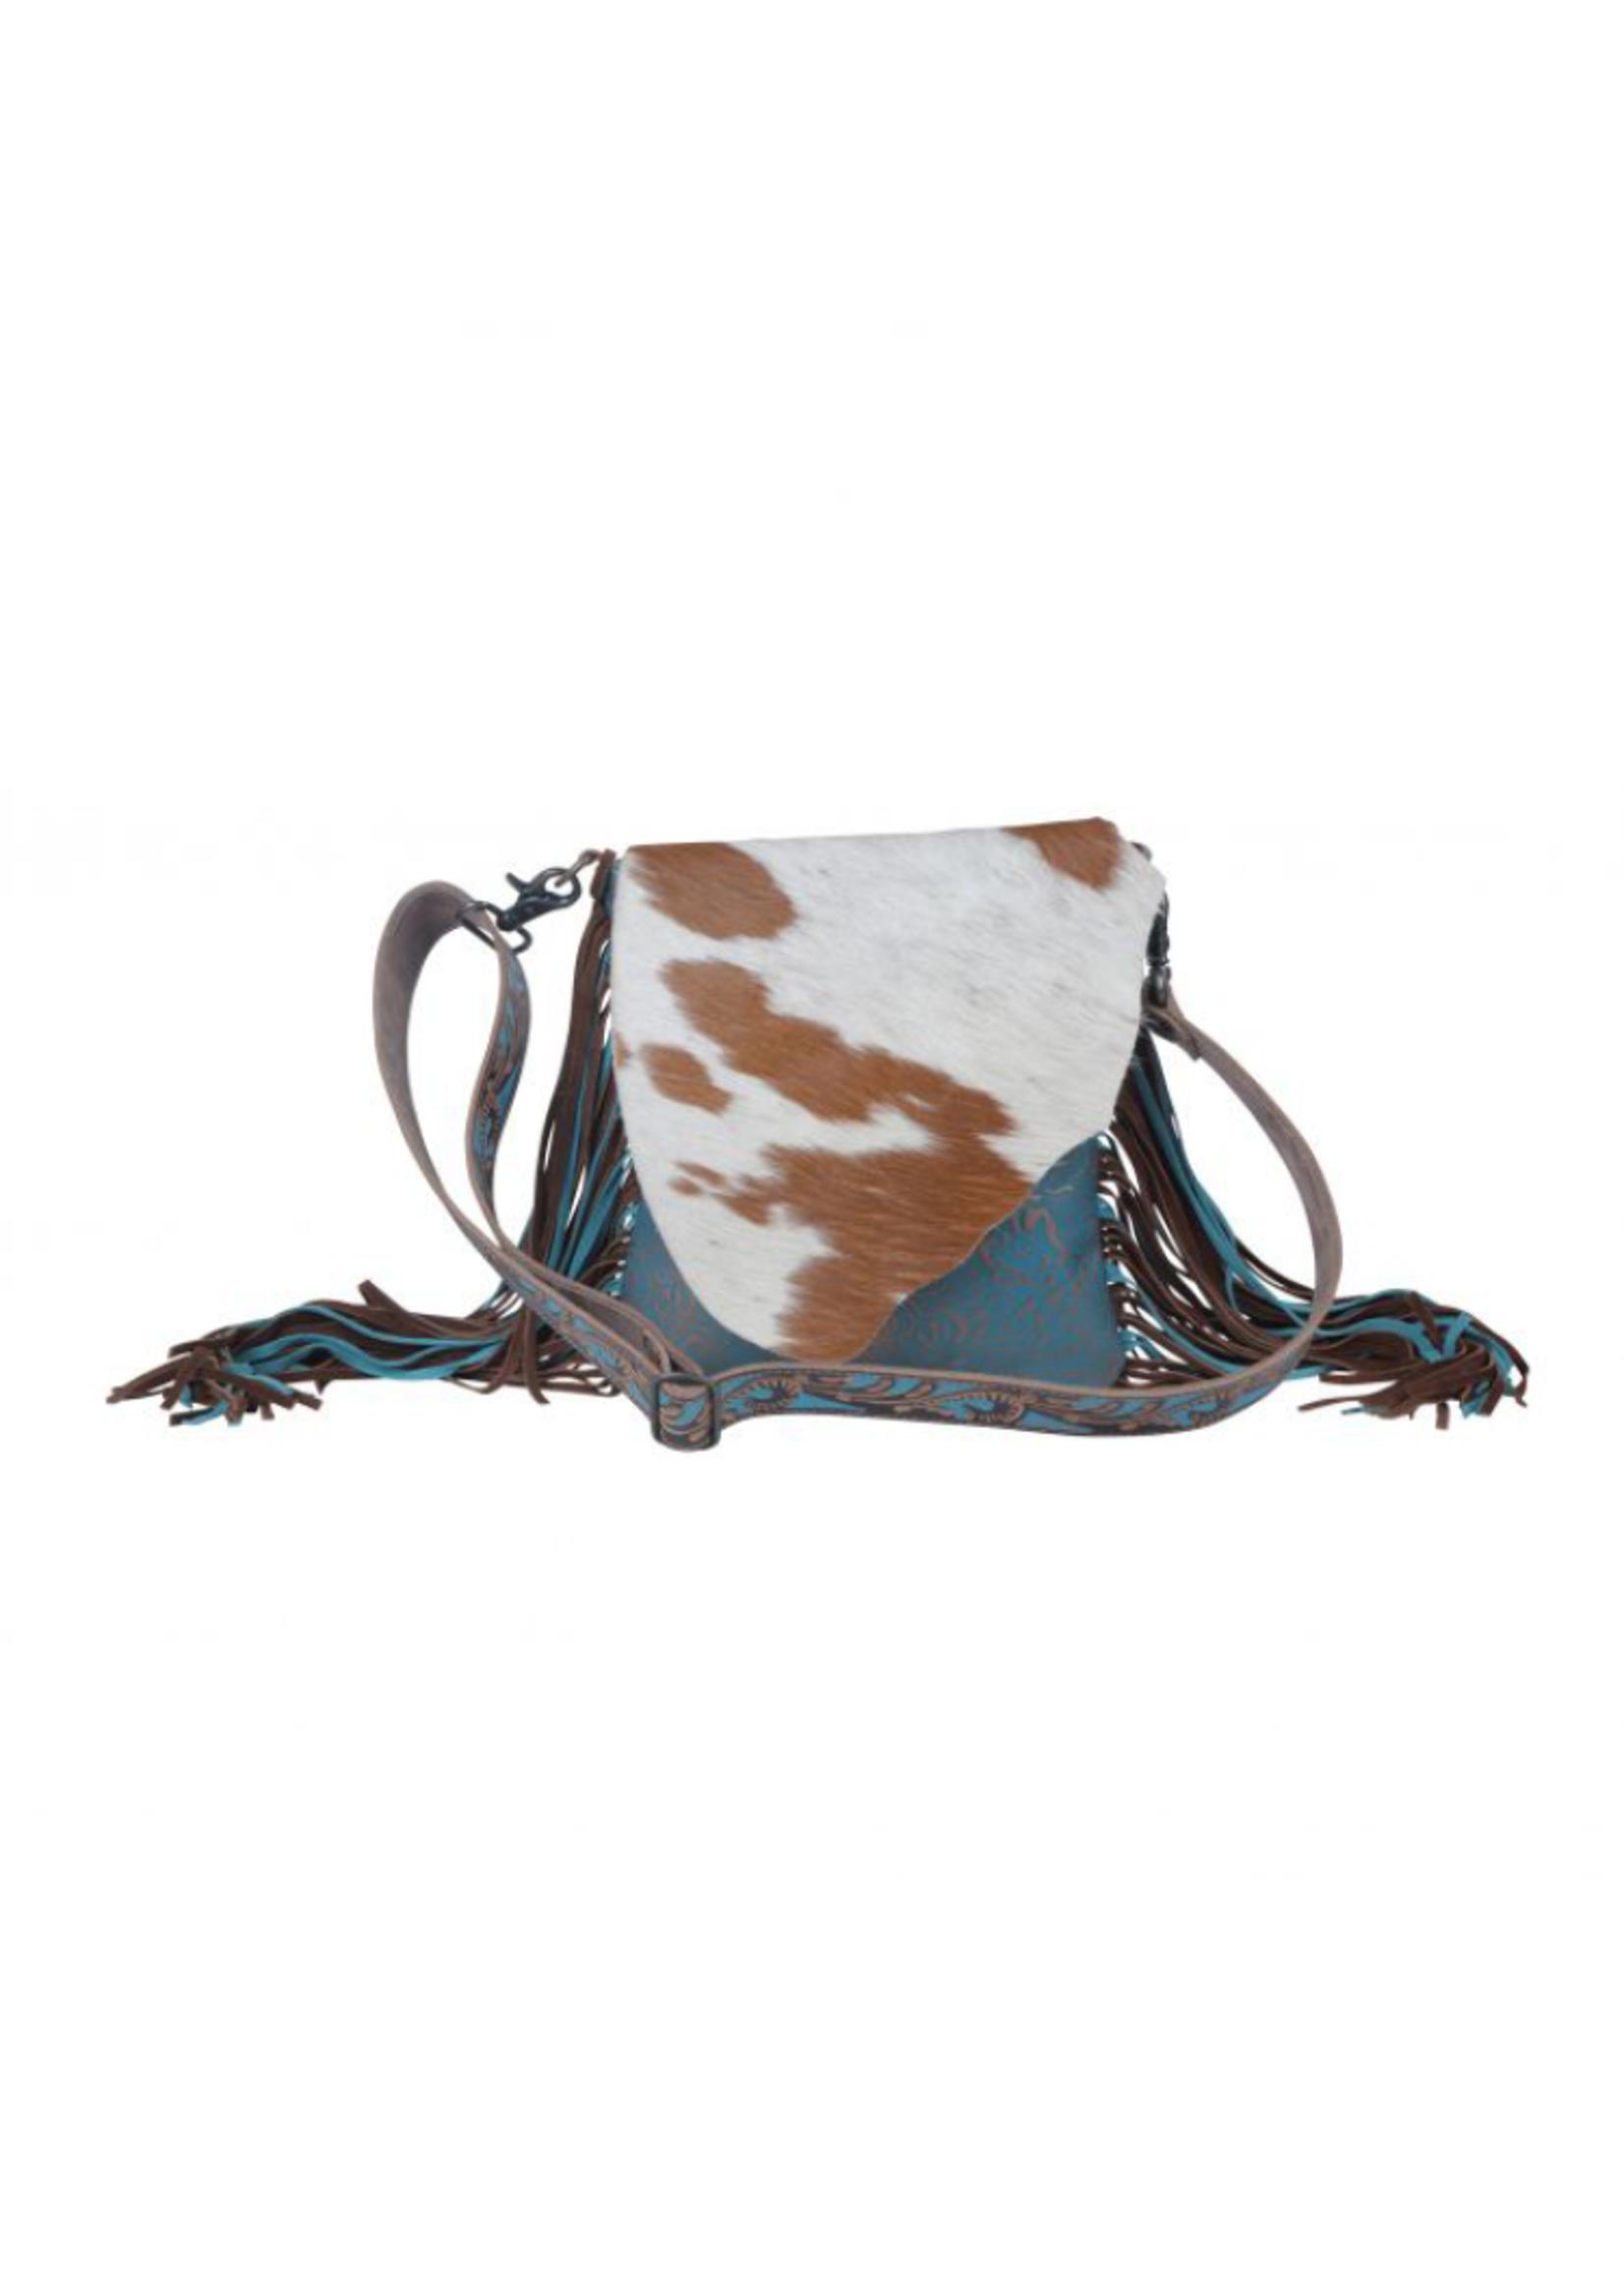 Myra Concealed Carry Bag